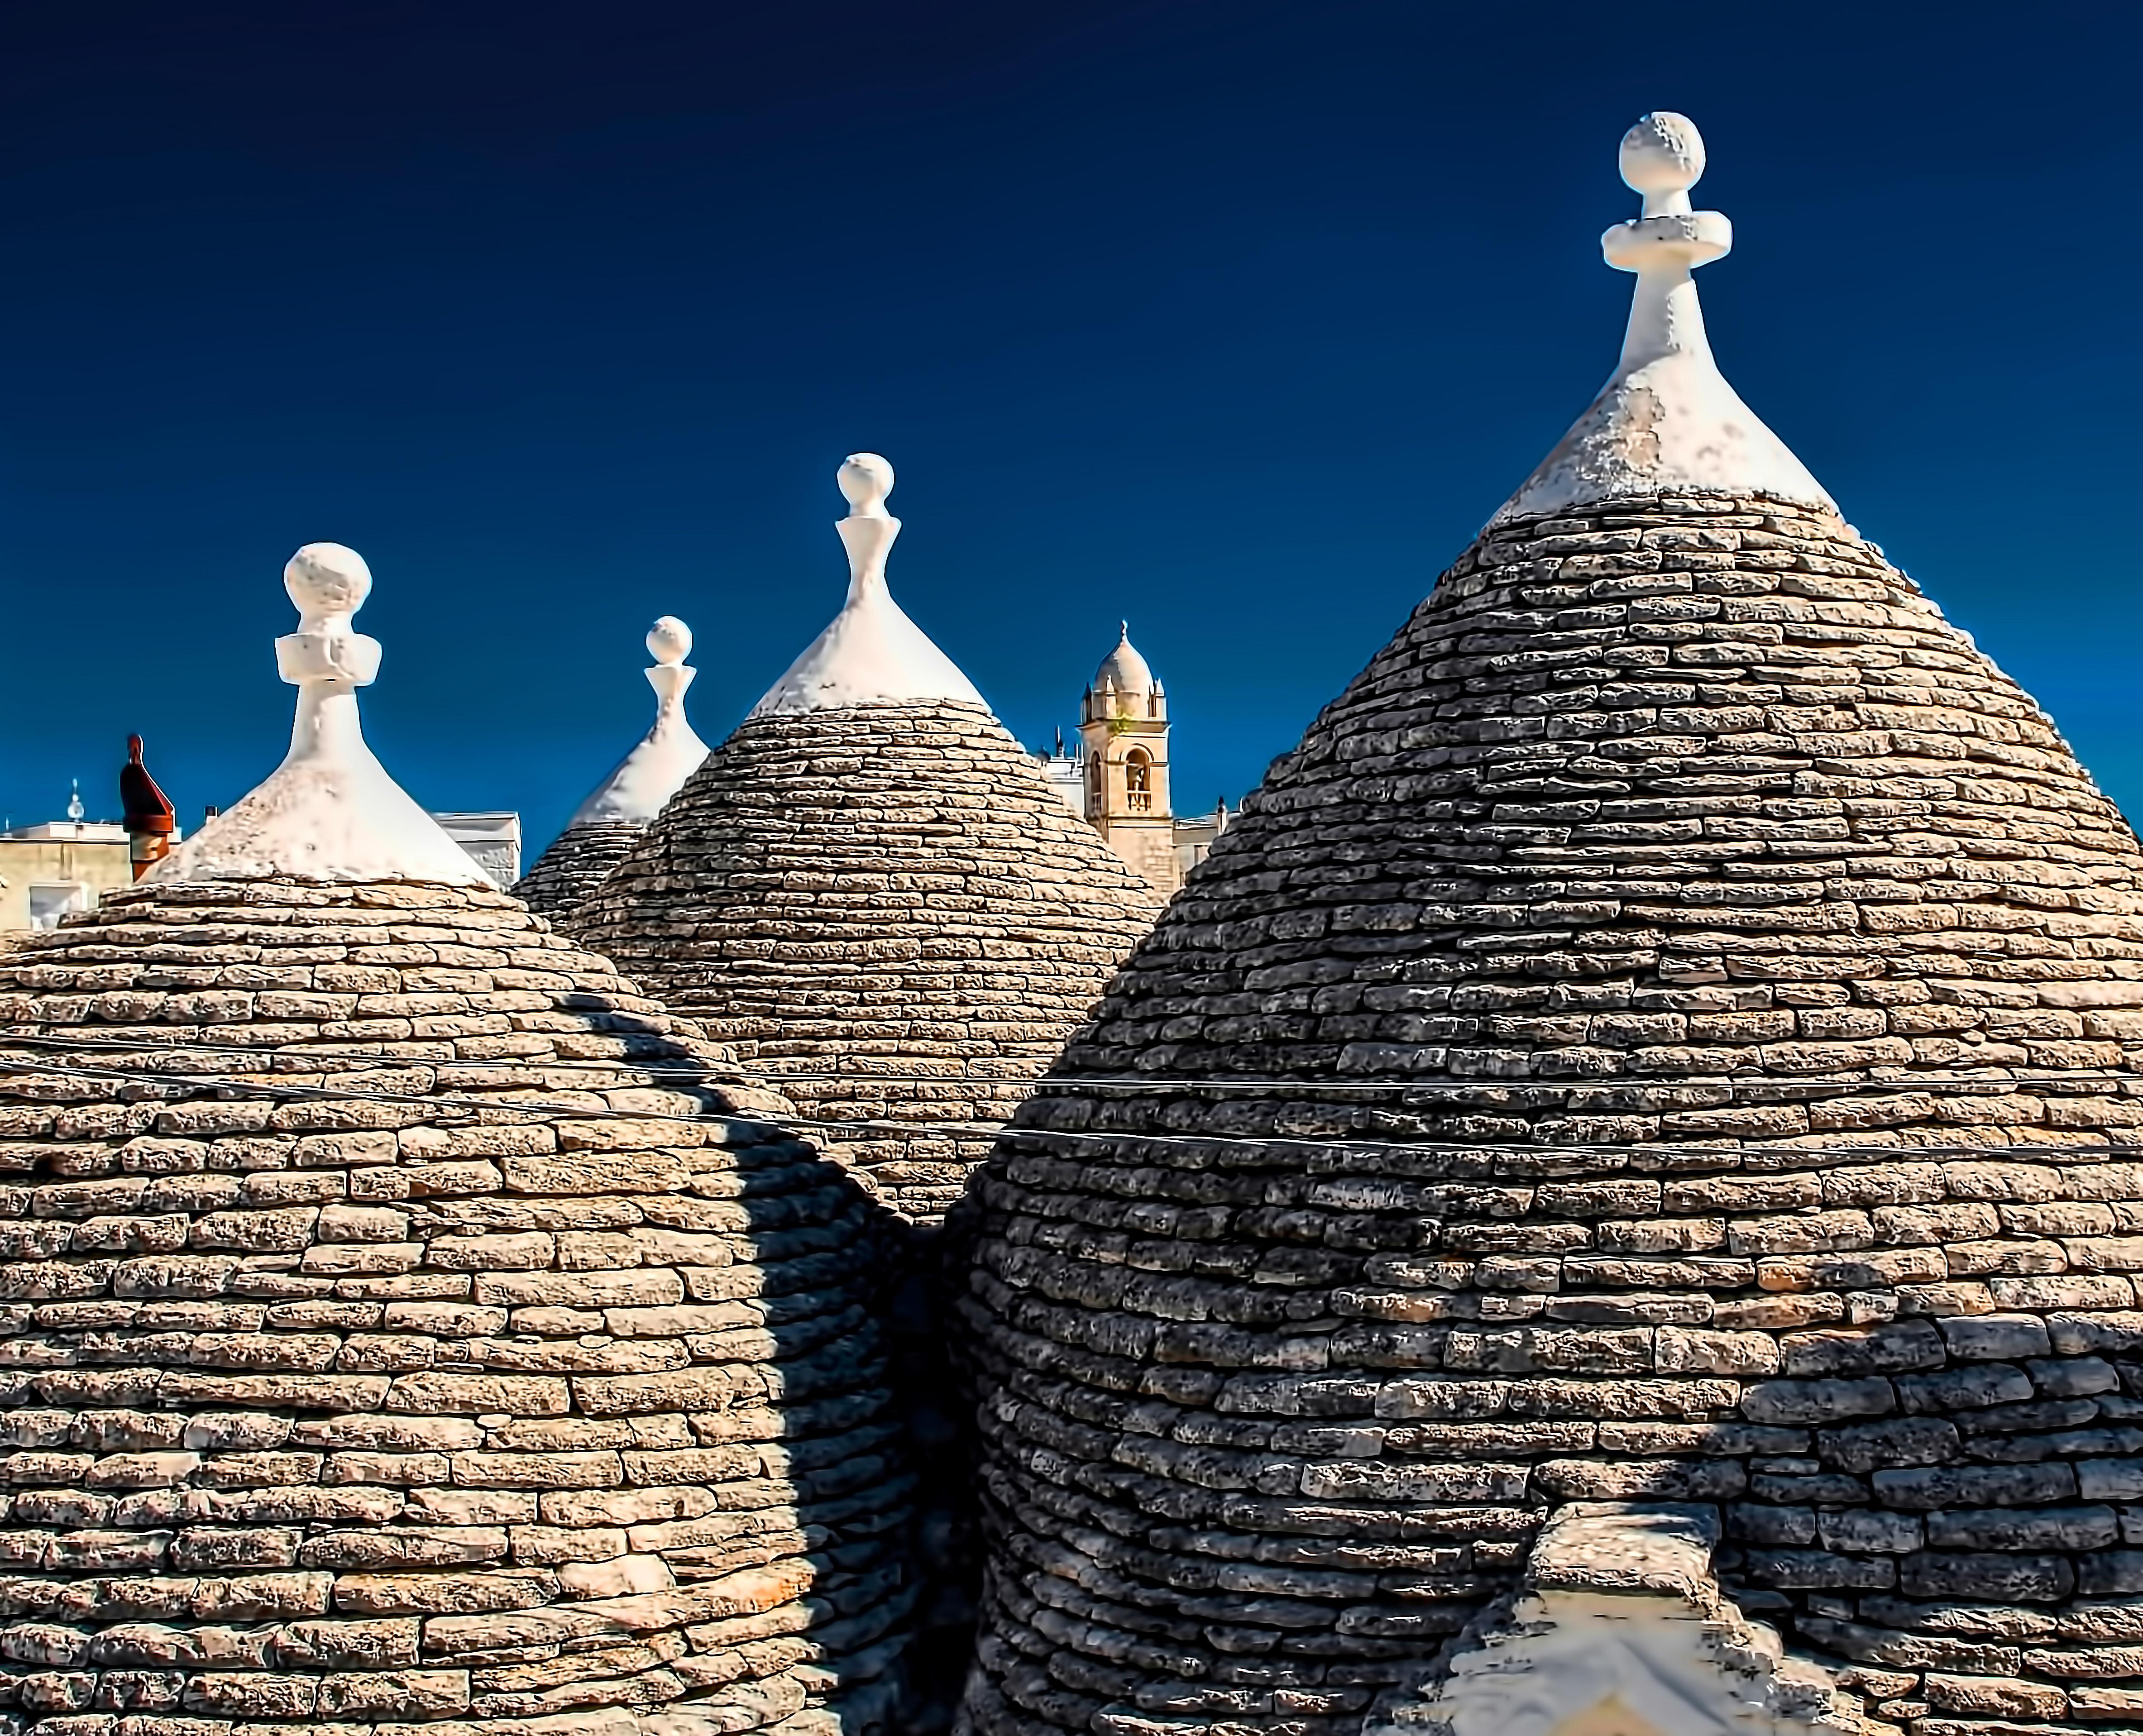 trulli rooftops in Alberobello